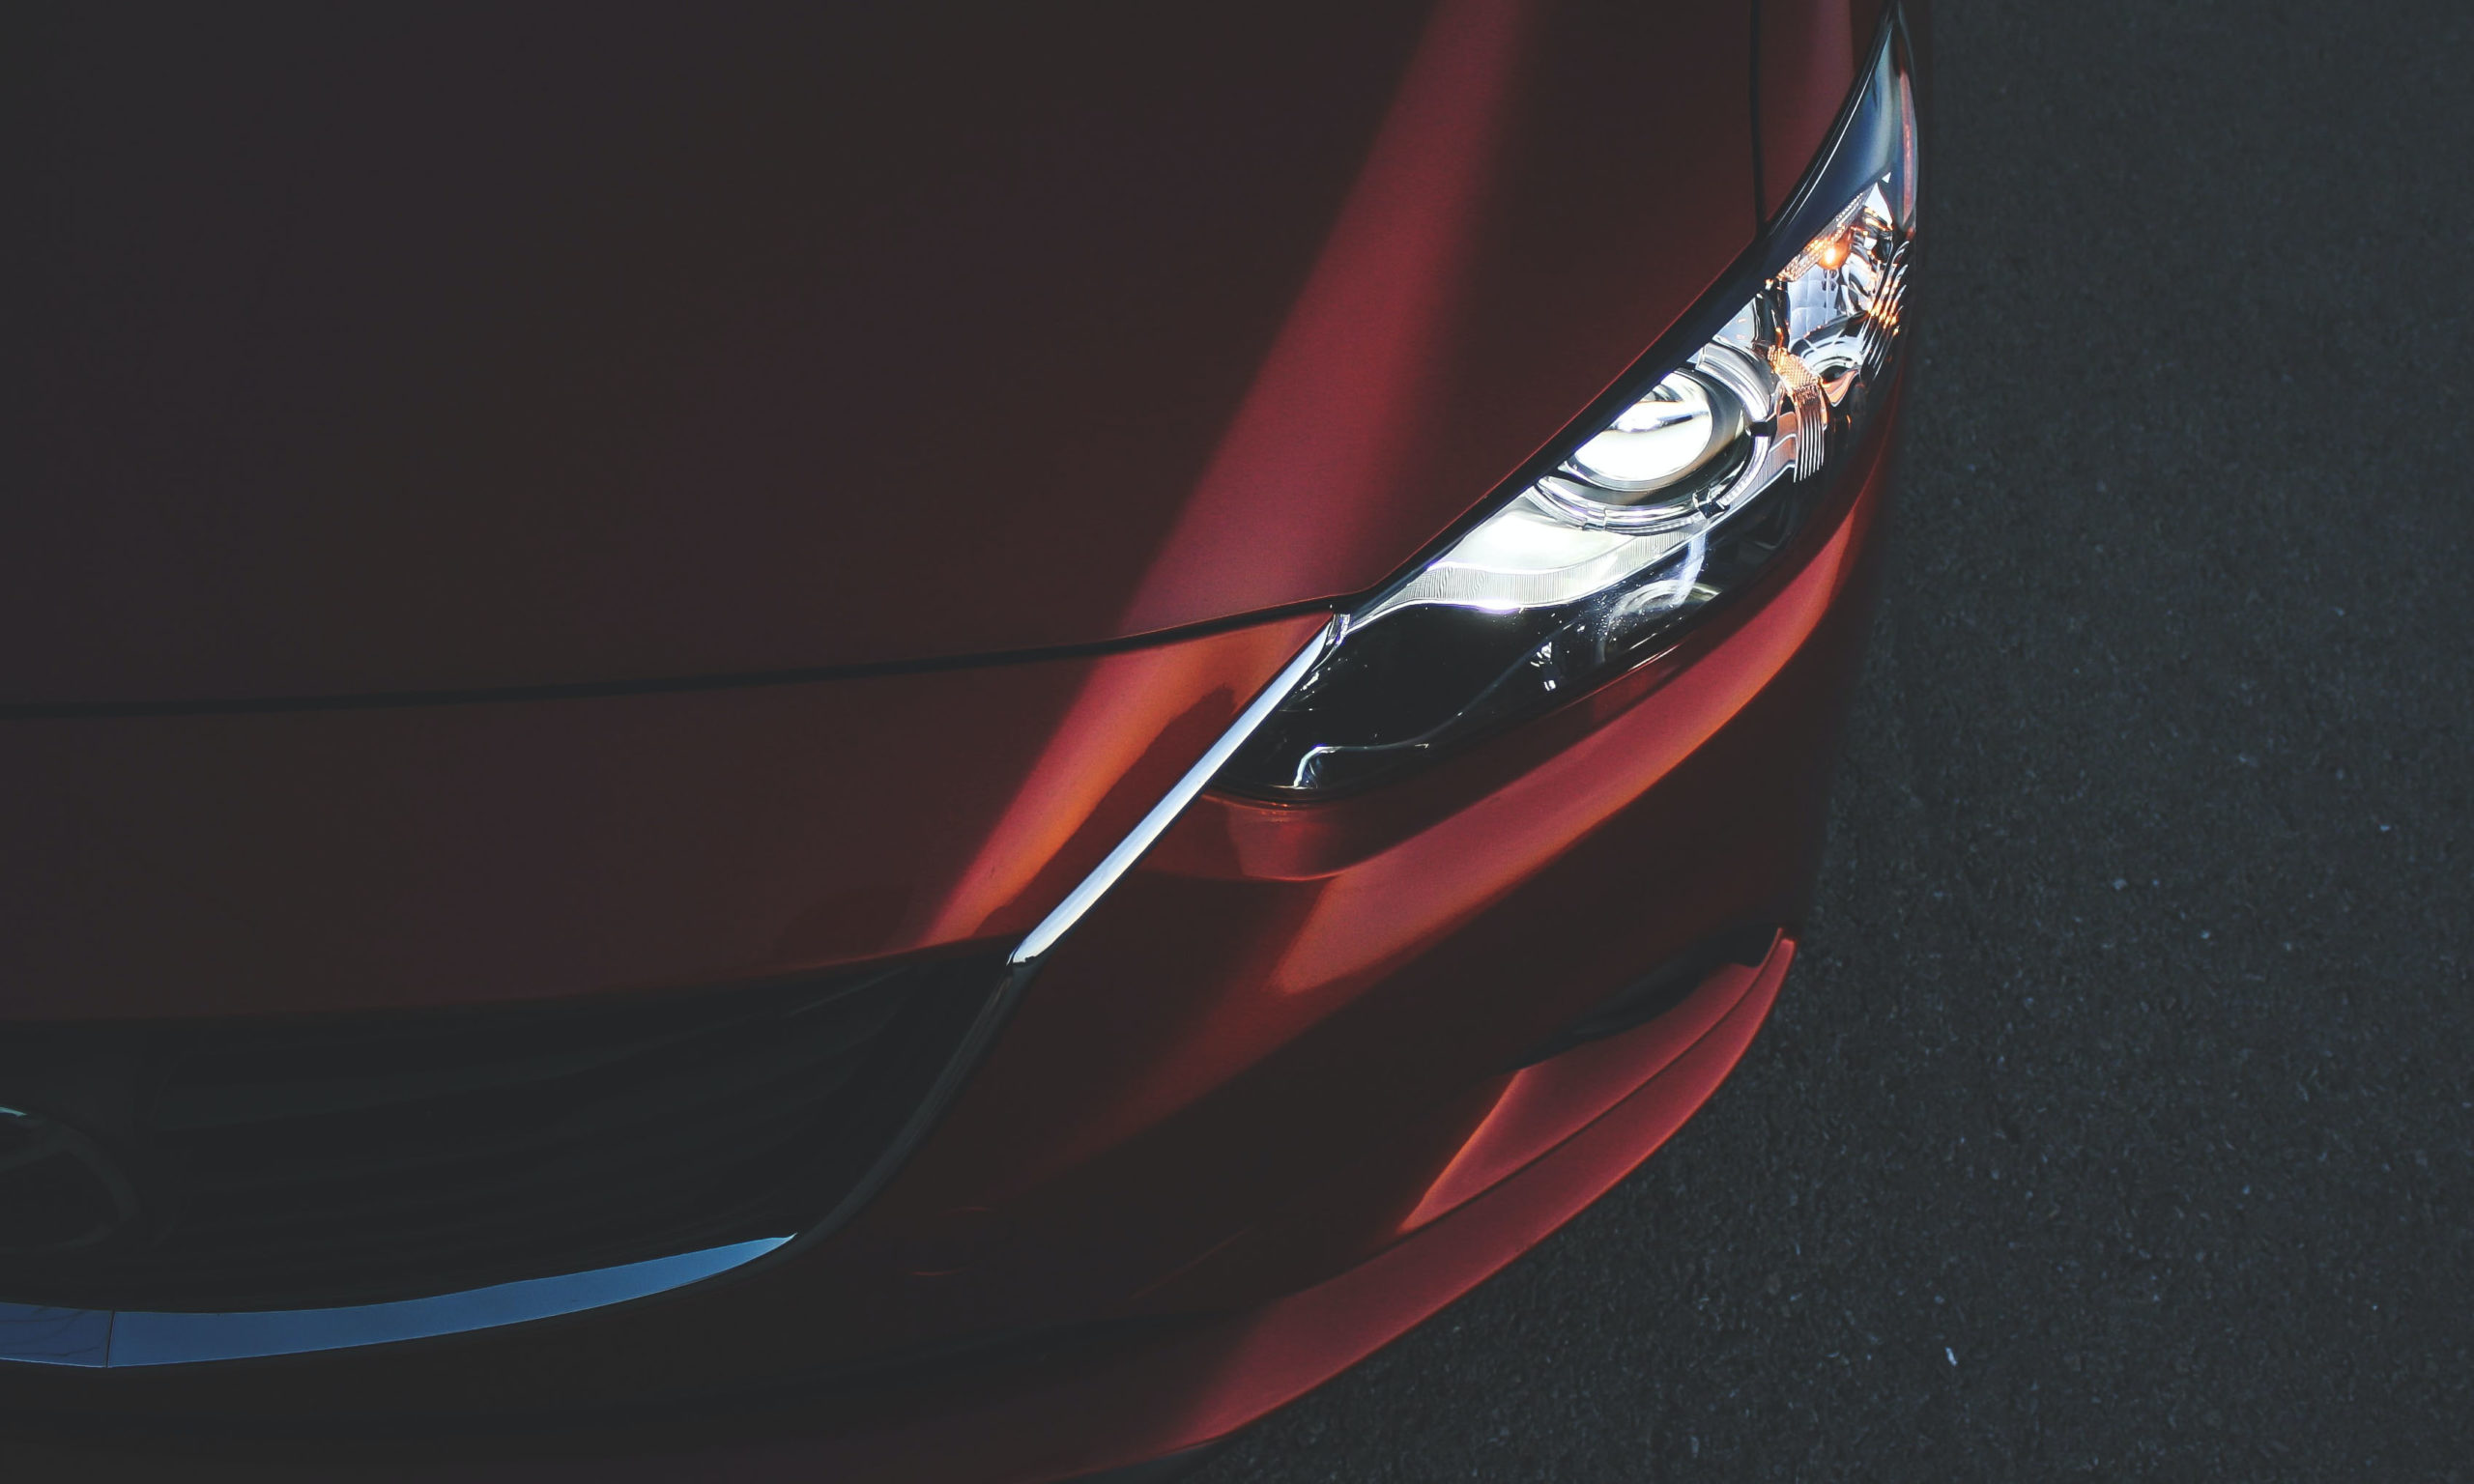 aftermarket car modifications